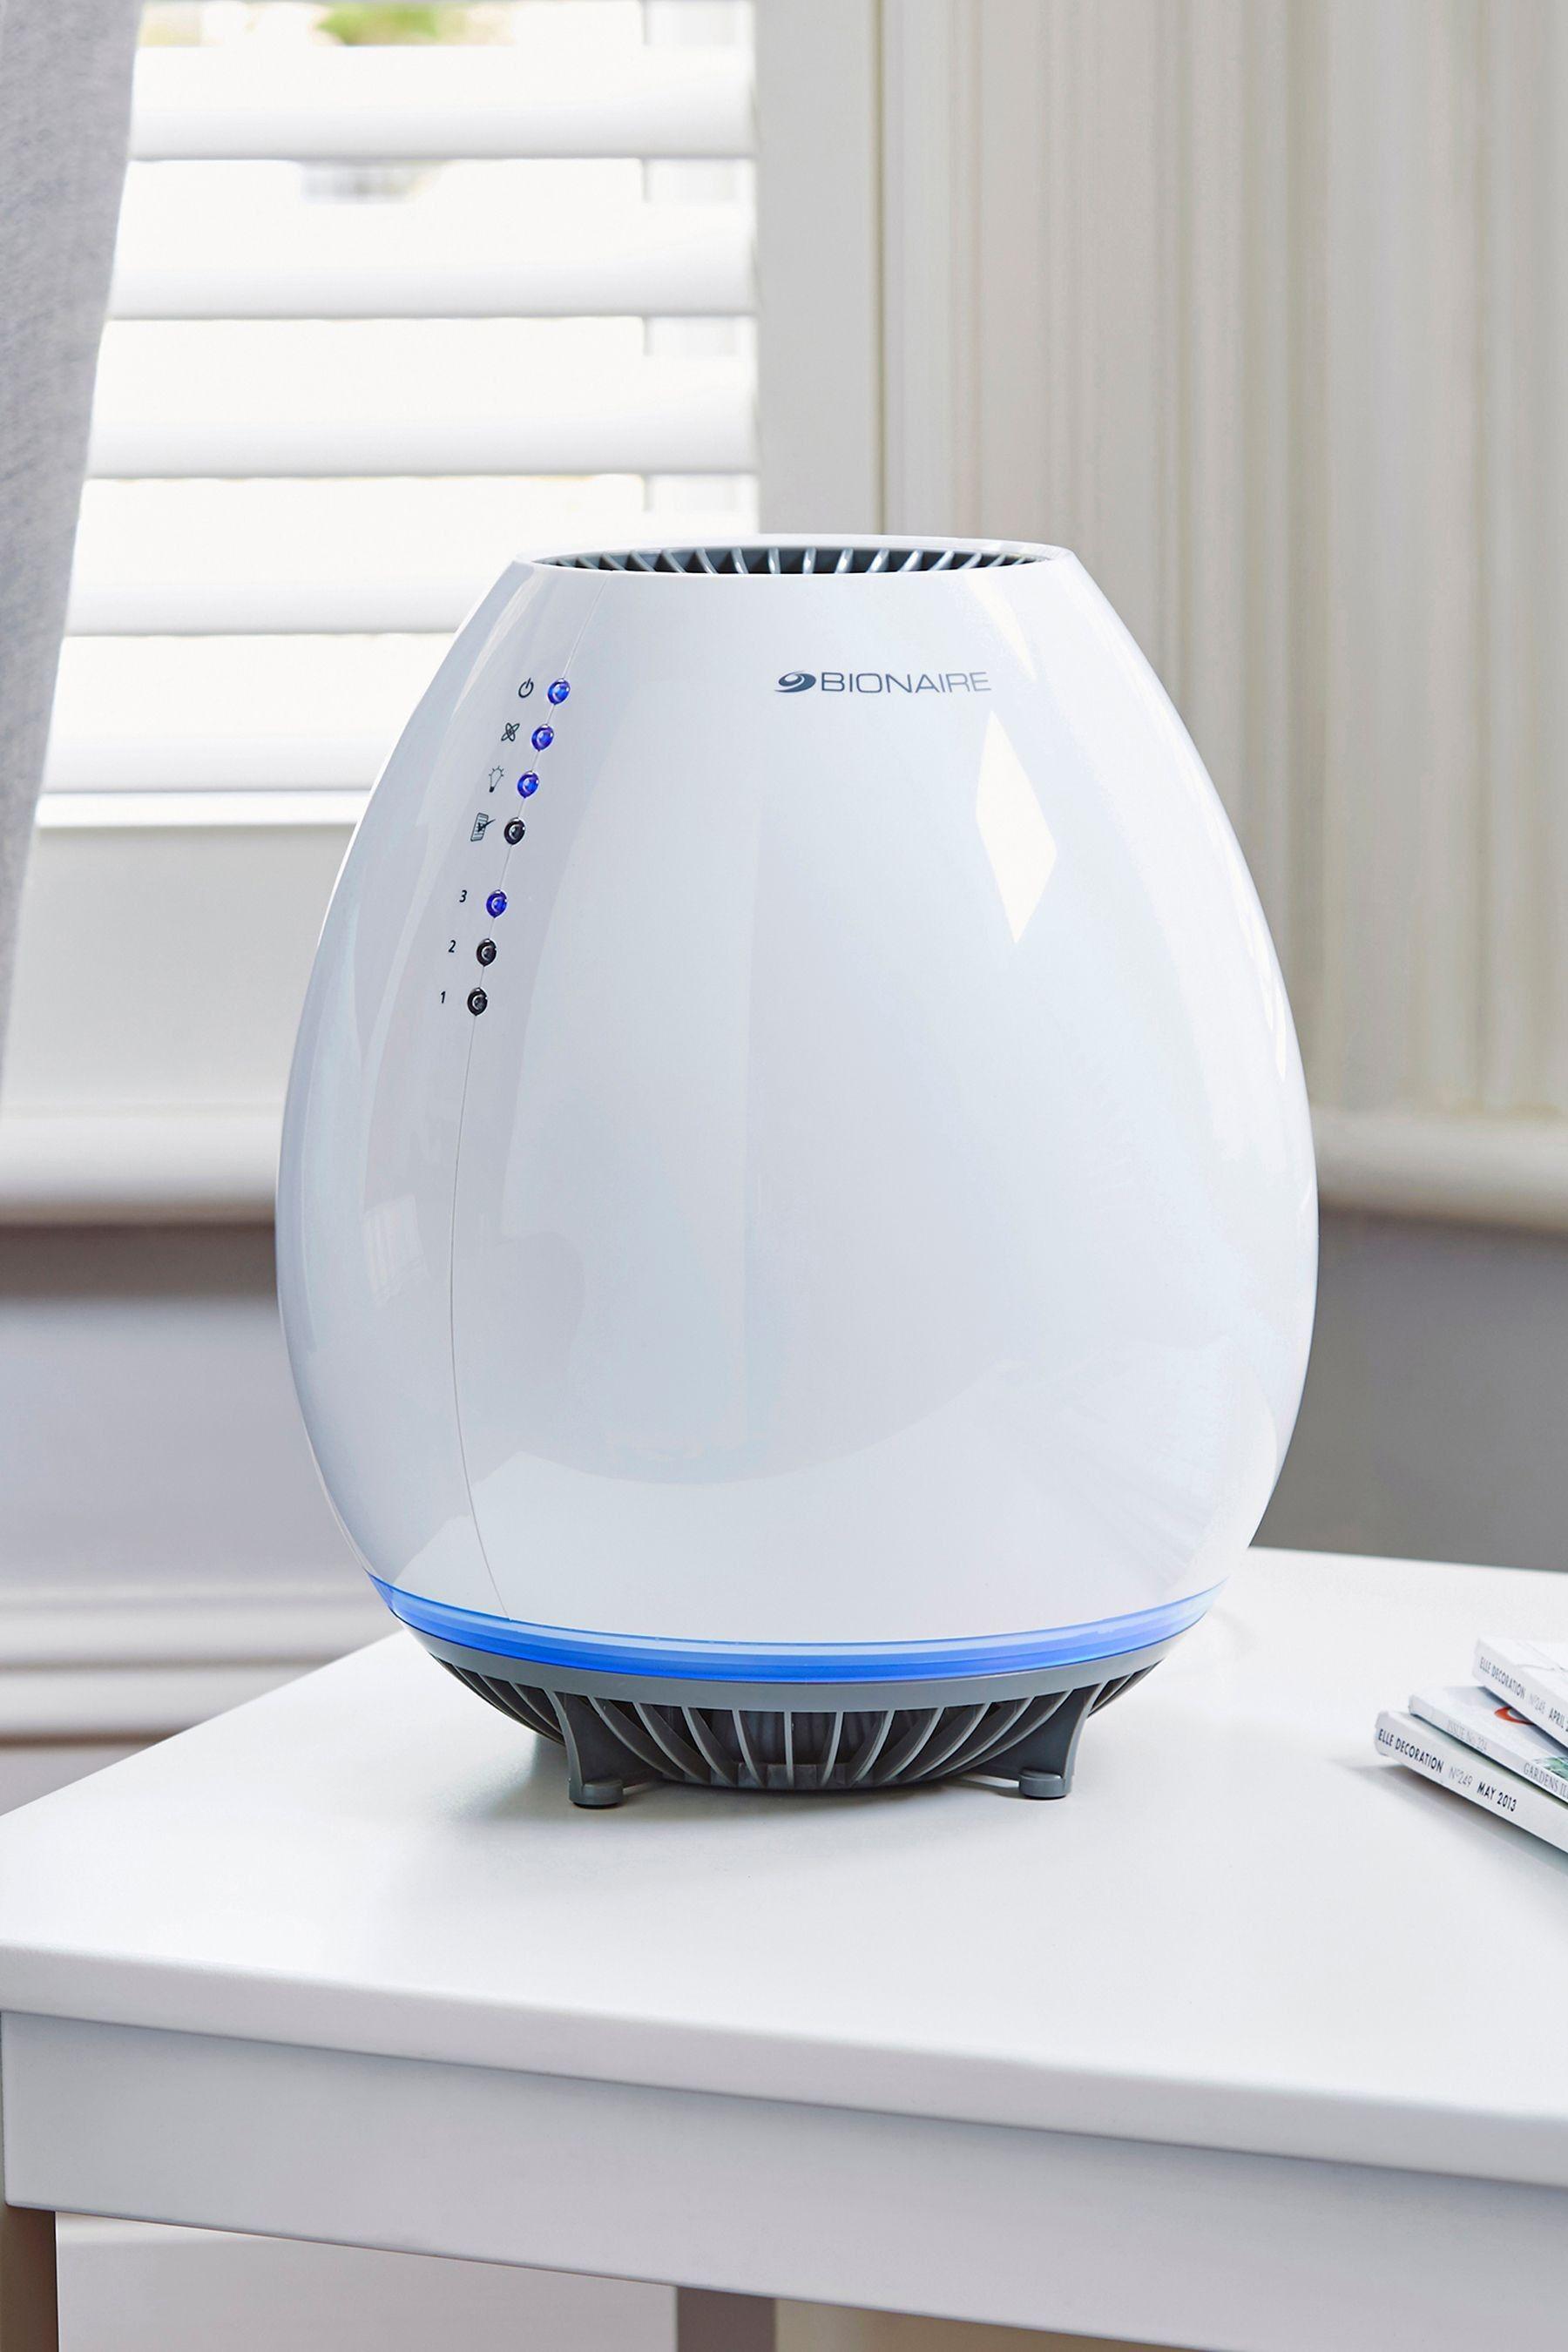 Bionaire Designer Air Purifier Air purifier, Bionaire